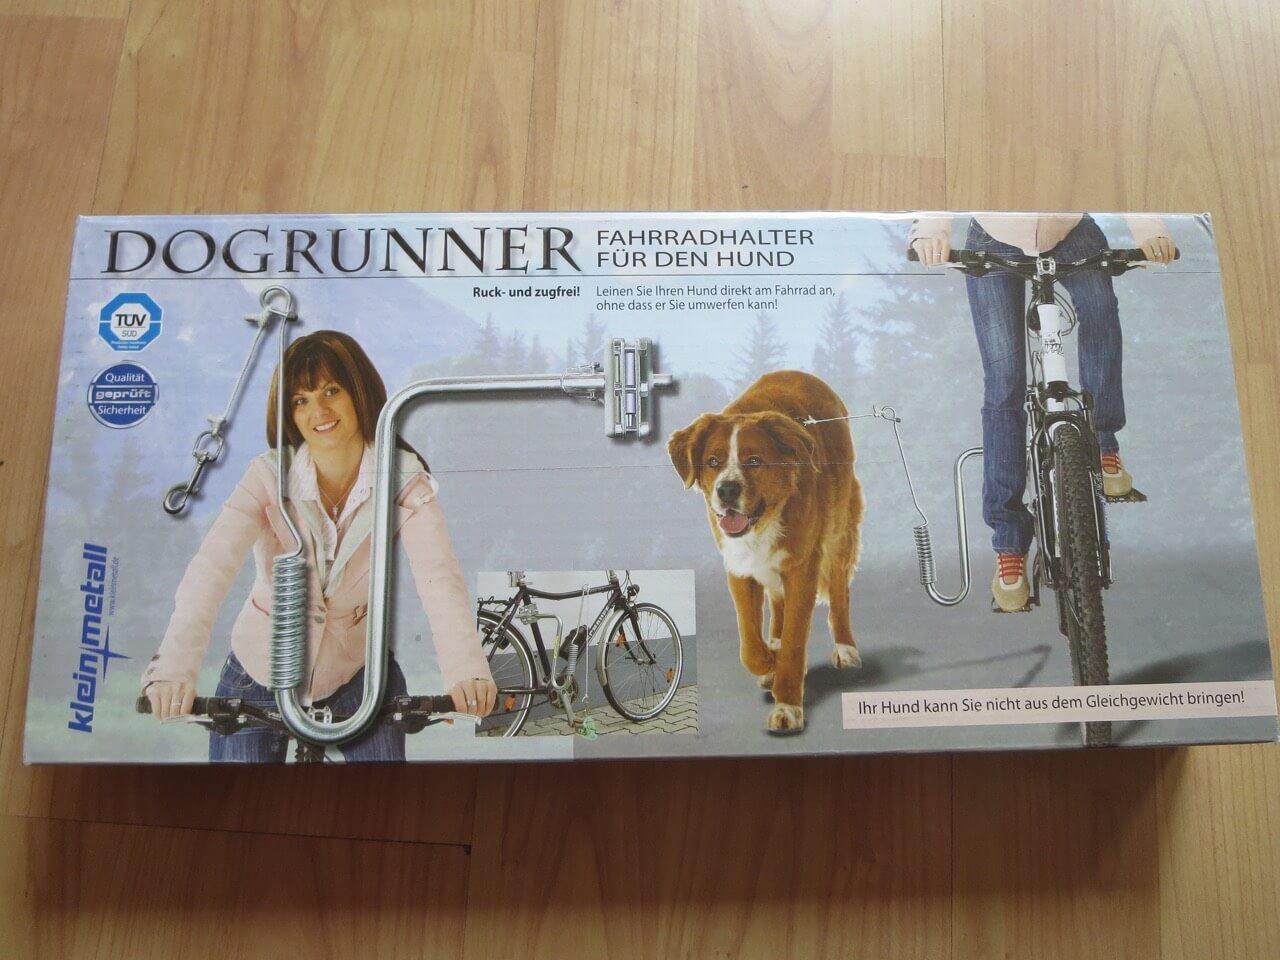 Fahrrad Abstandhalter Dogrunner Test